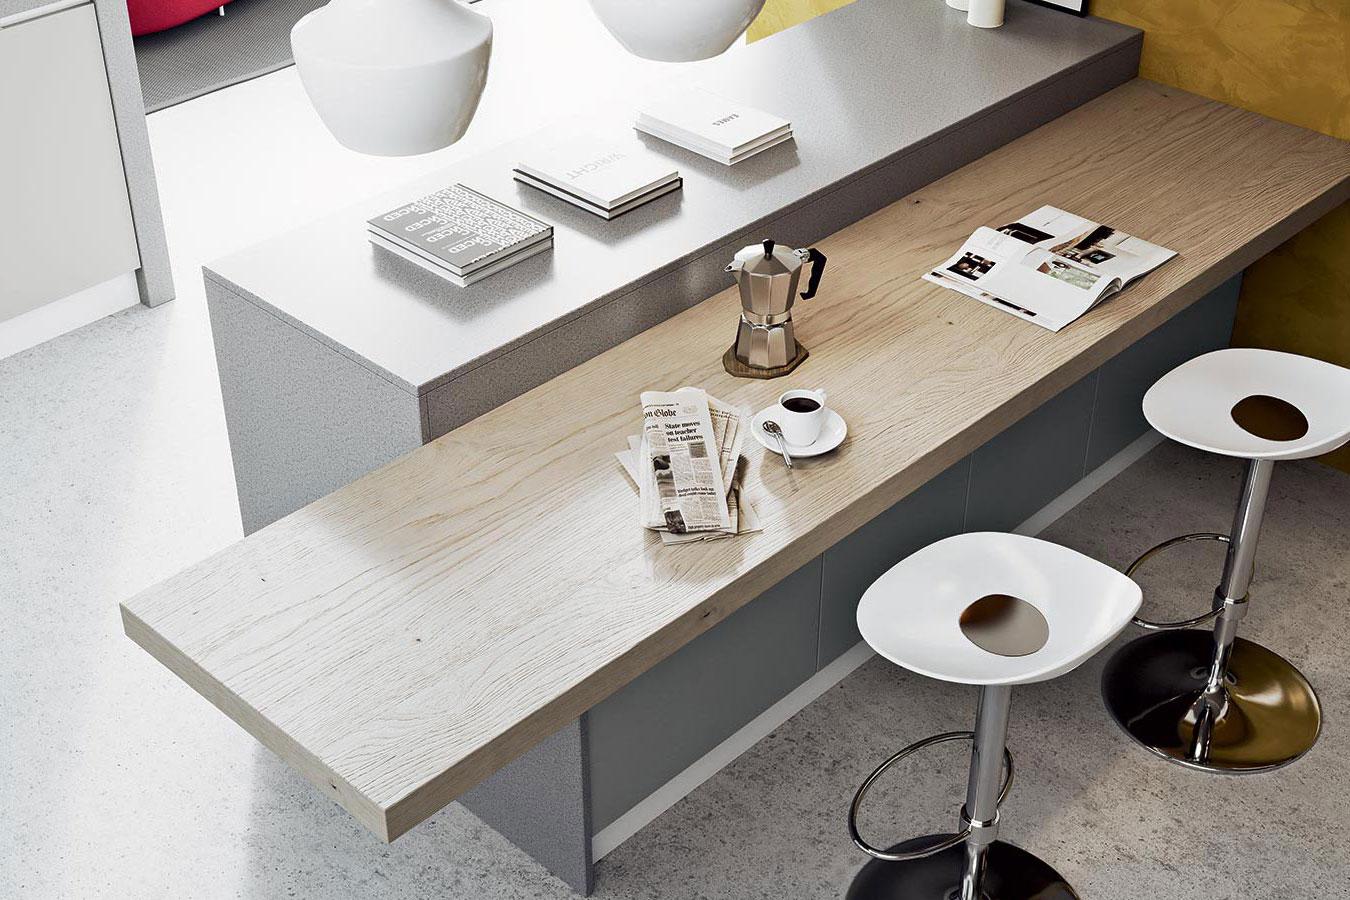 Cucina luna di arredo3 righetti mobili novara for Cucina luna arredo3 prezzi